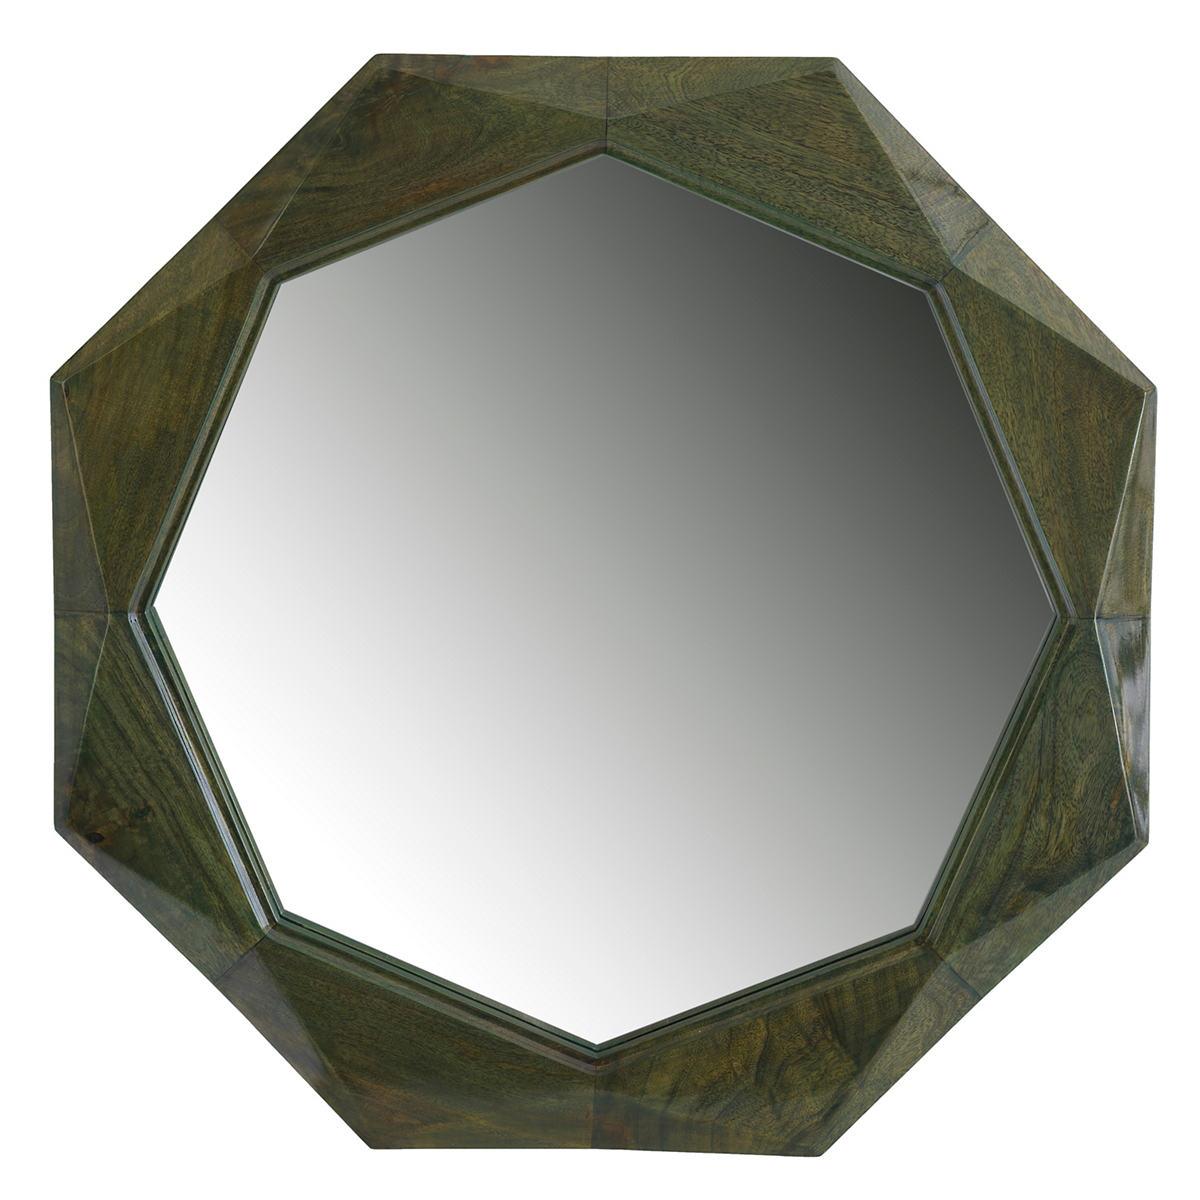 Liko Evergreen Mirror